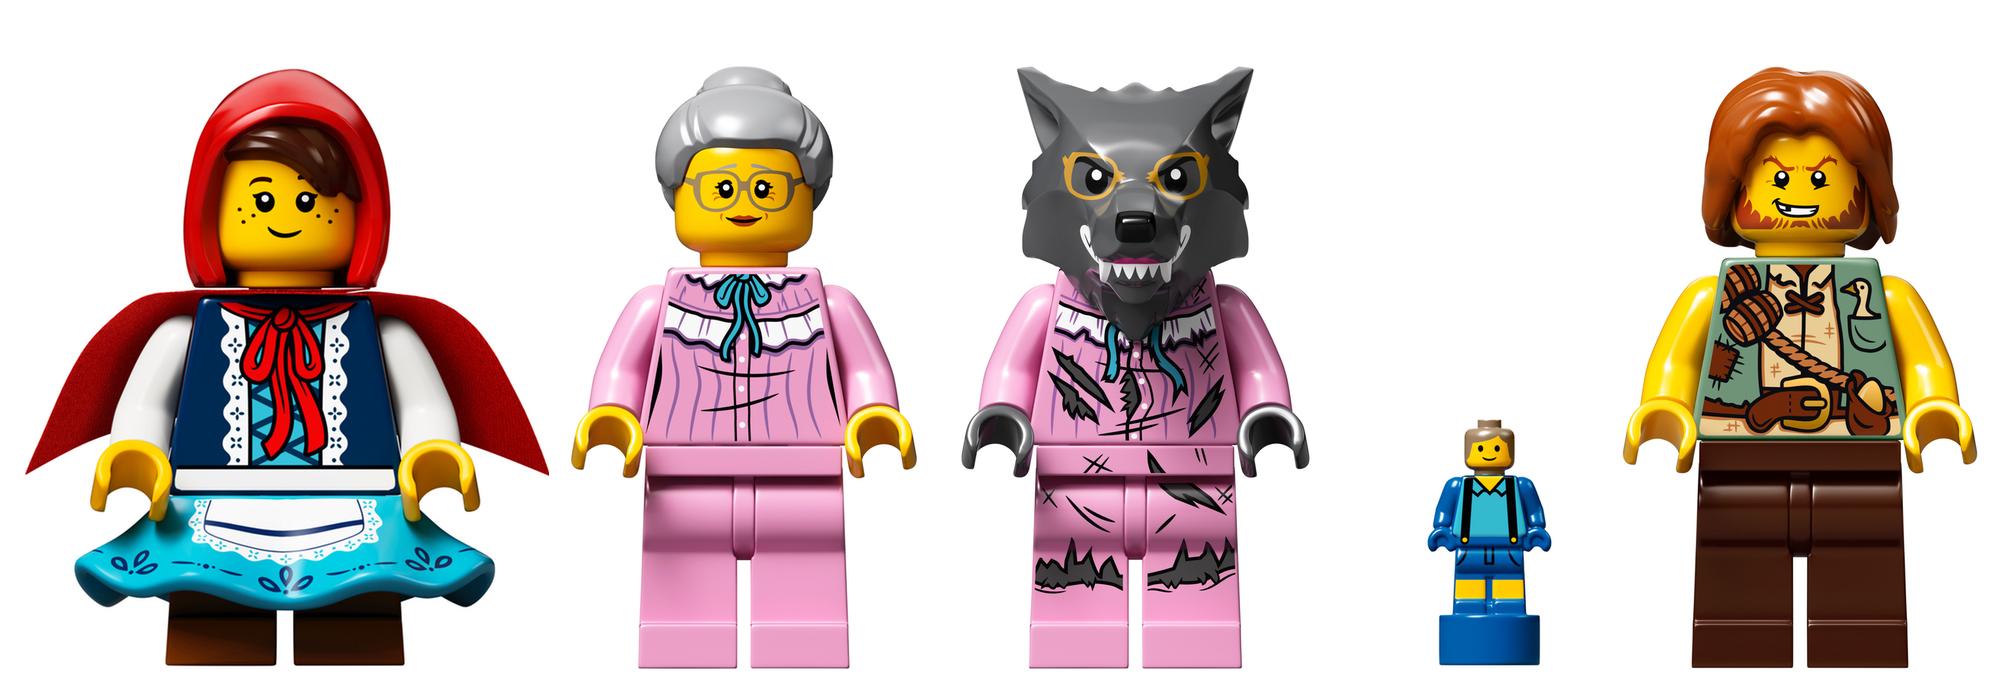 LEGO Pop-Up Book Minifigures